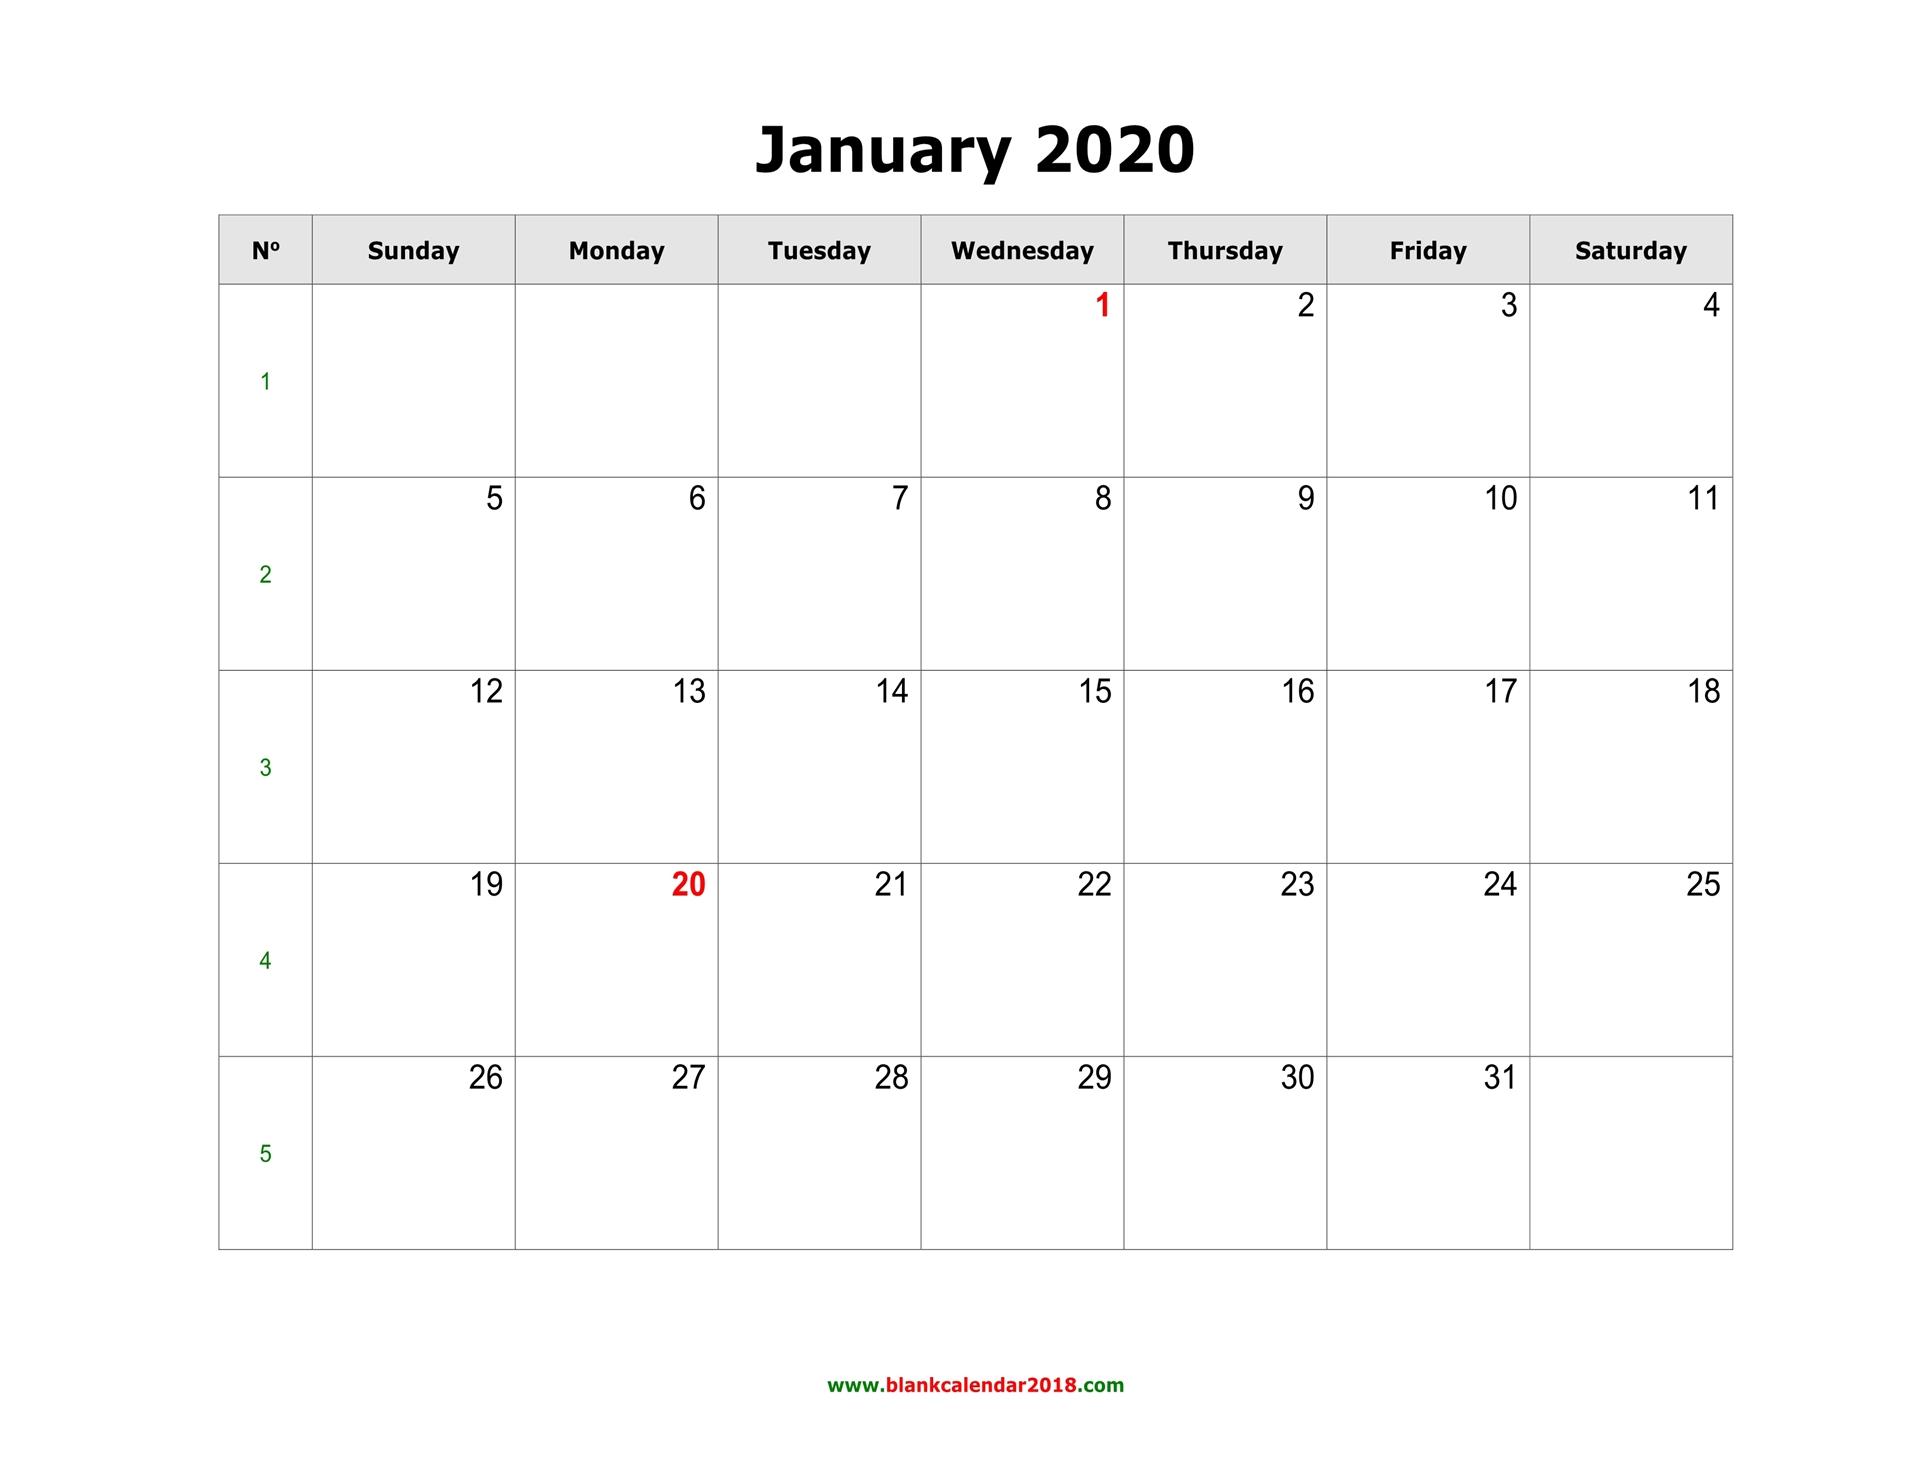 Blank Calendar 2020 inside Fill In Blank Calendar